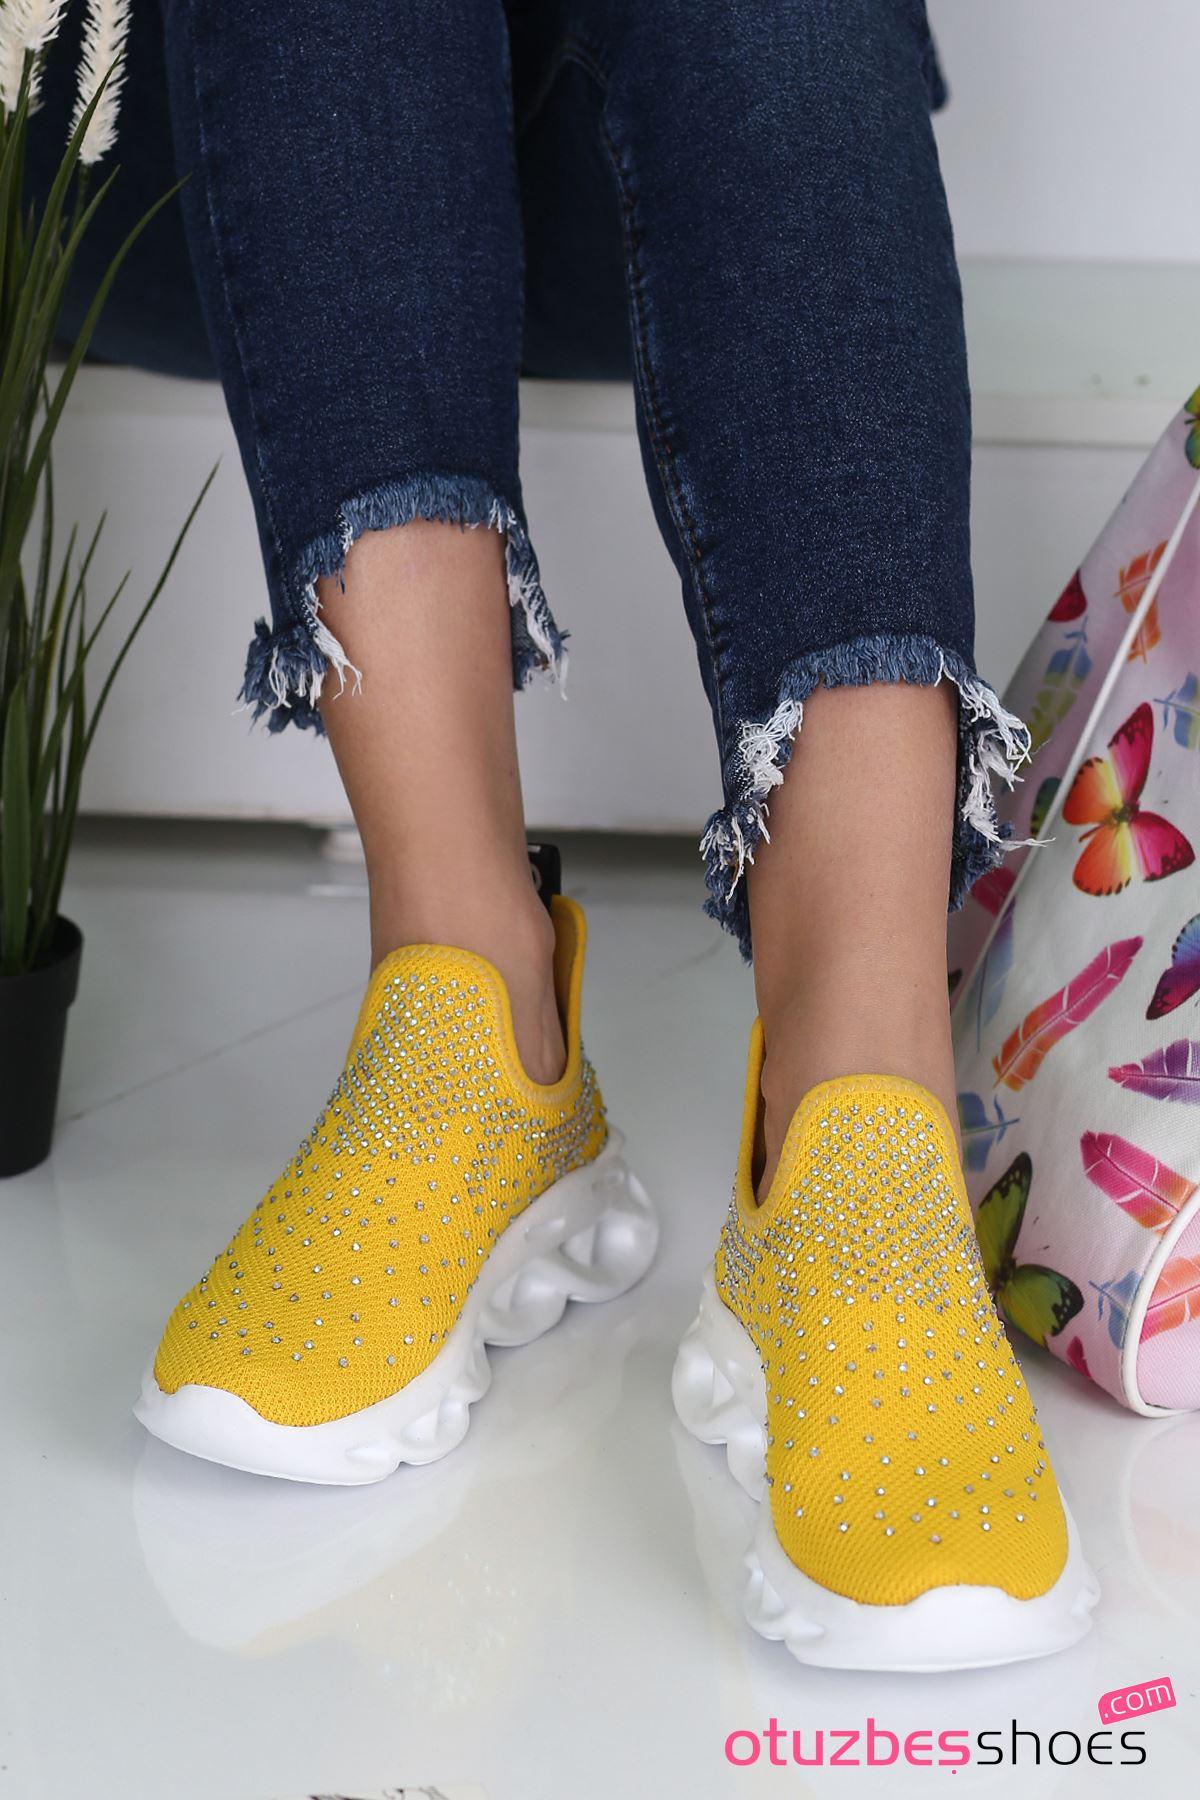 Halley Taş Detay Triko Spor Ayakkabı Sarı